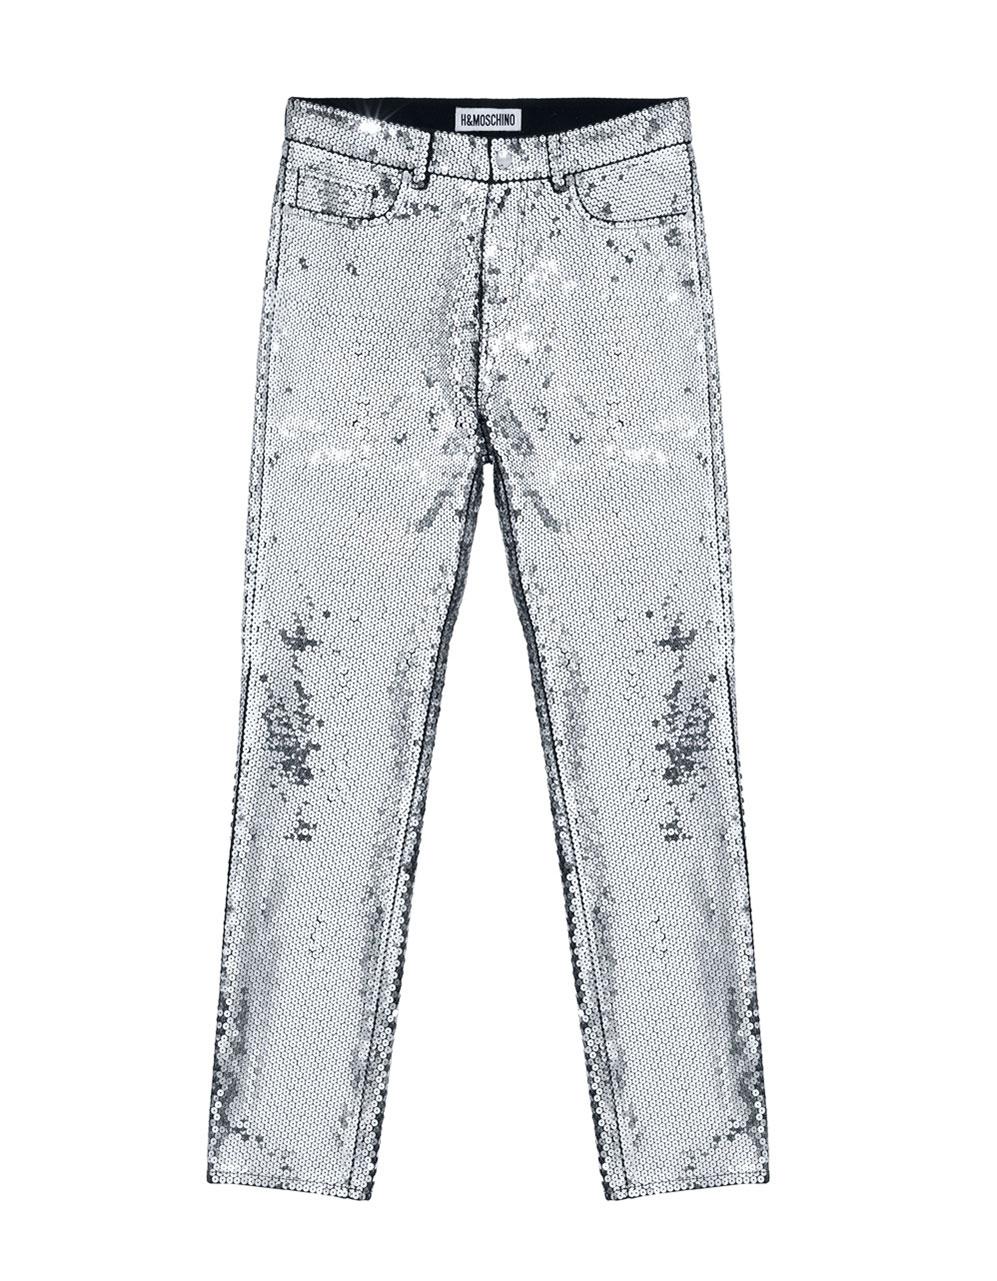 Byxor med silverpaljetter Moschino x H&M